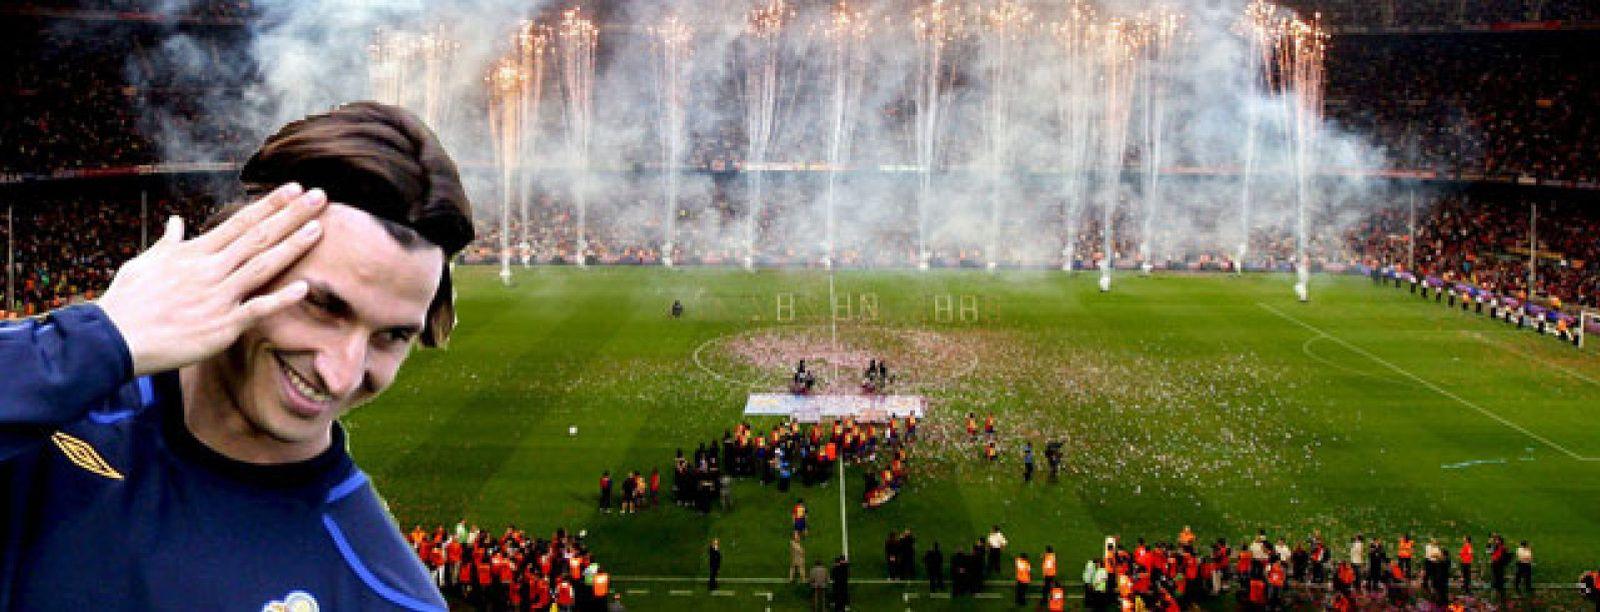 Foto: El Camp Nou ya espera a Ibrahimovic